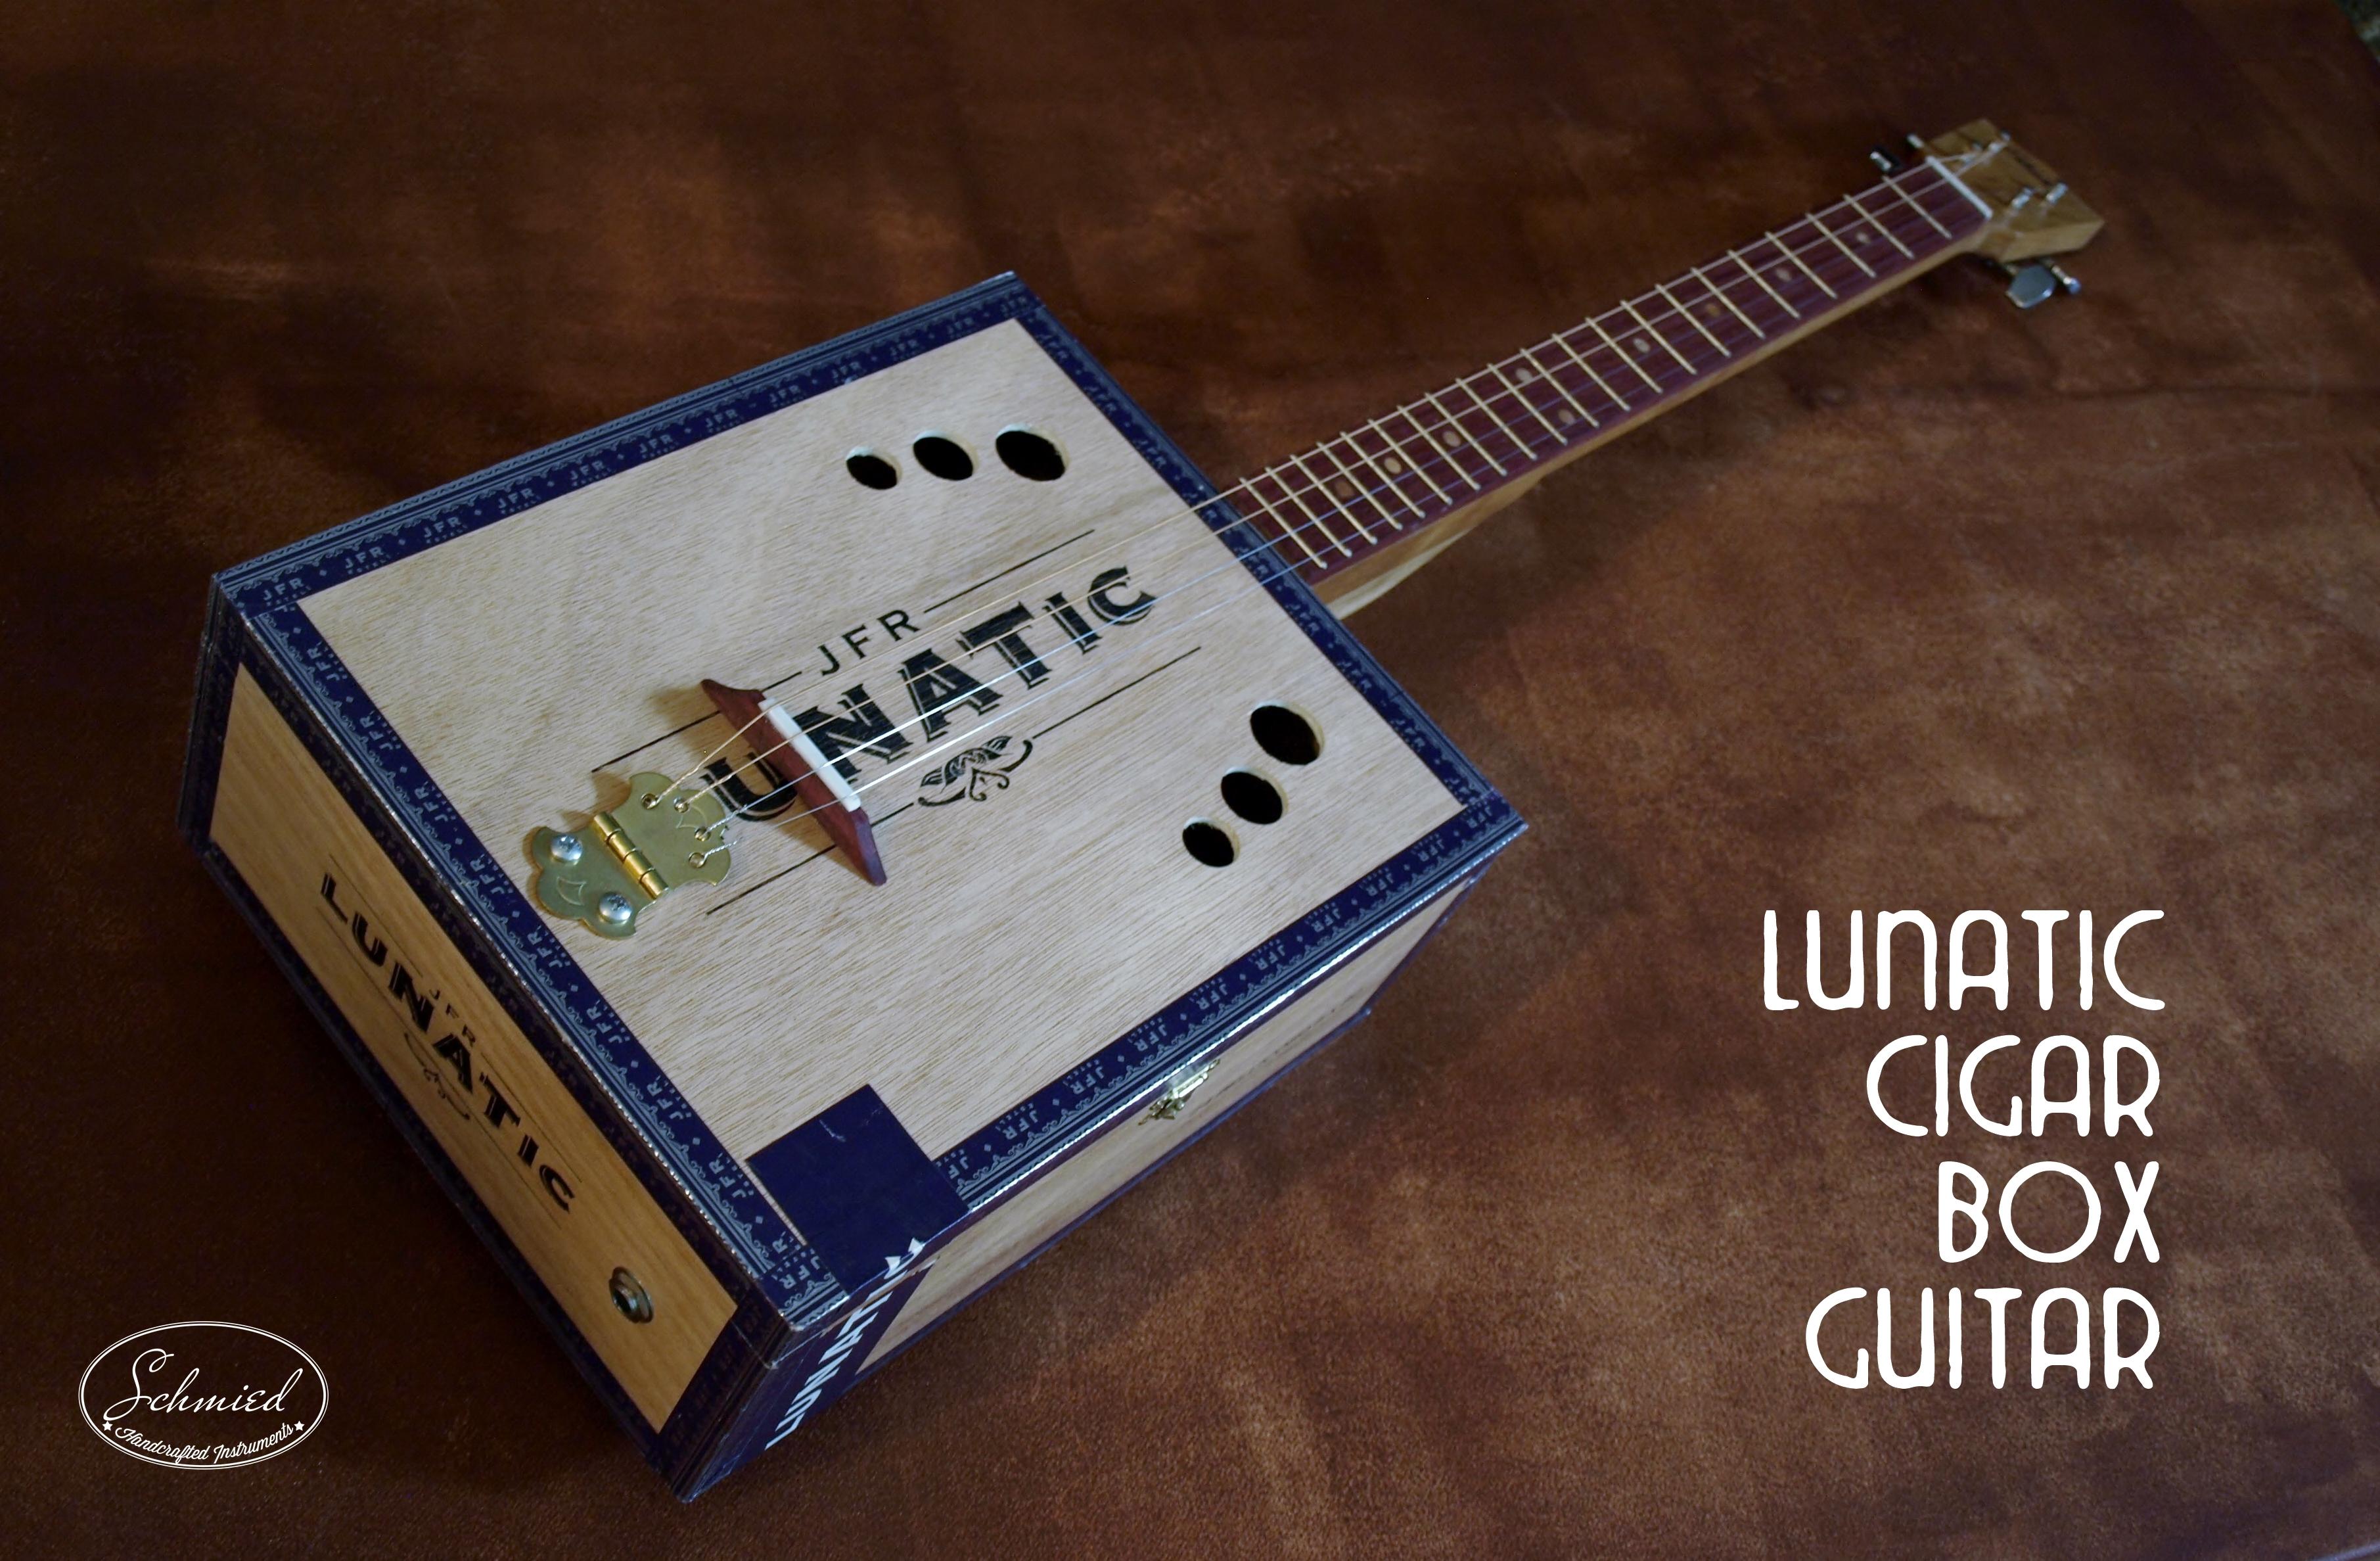 Cigar Box Guitar Images